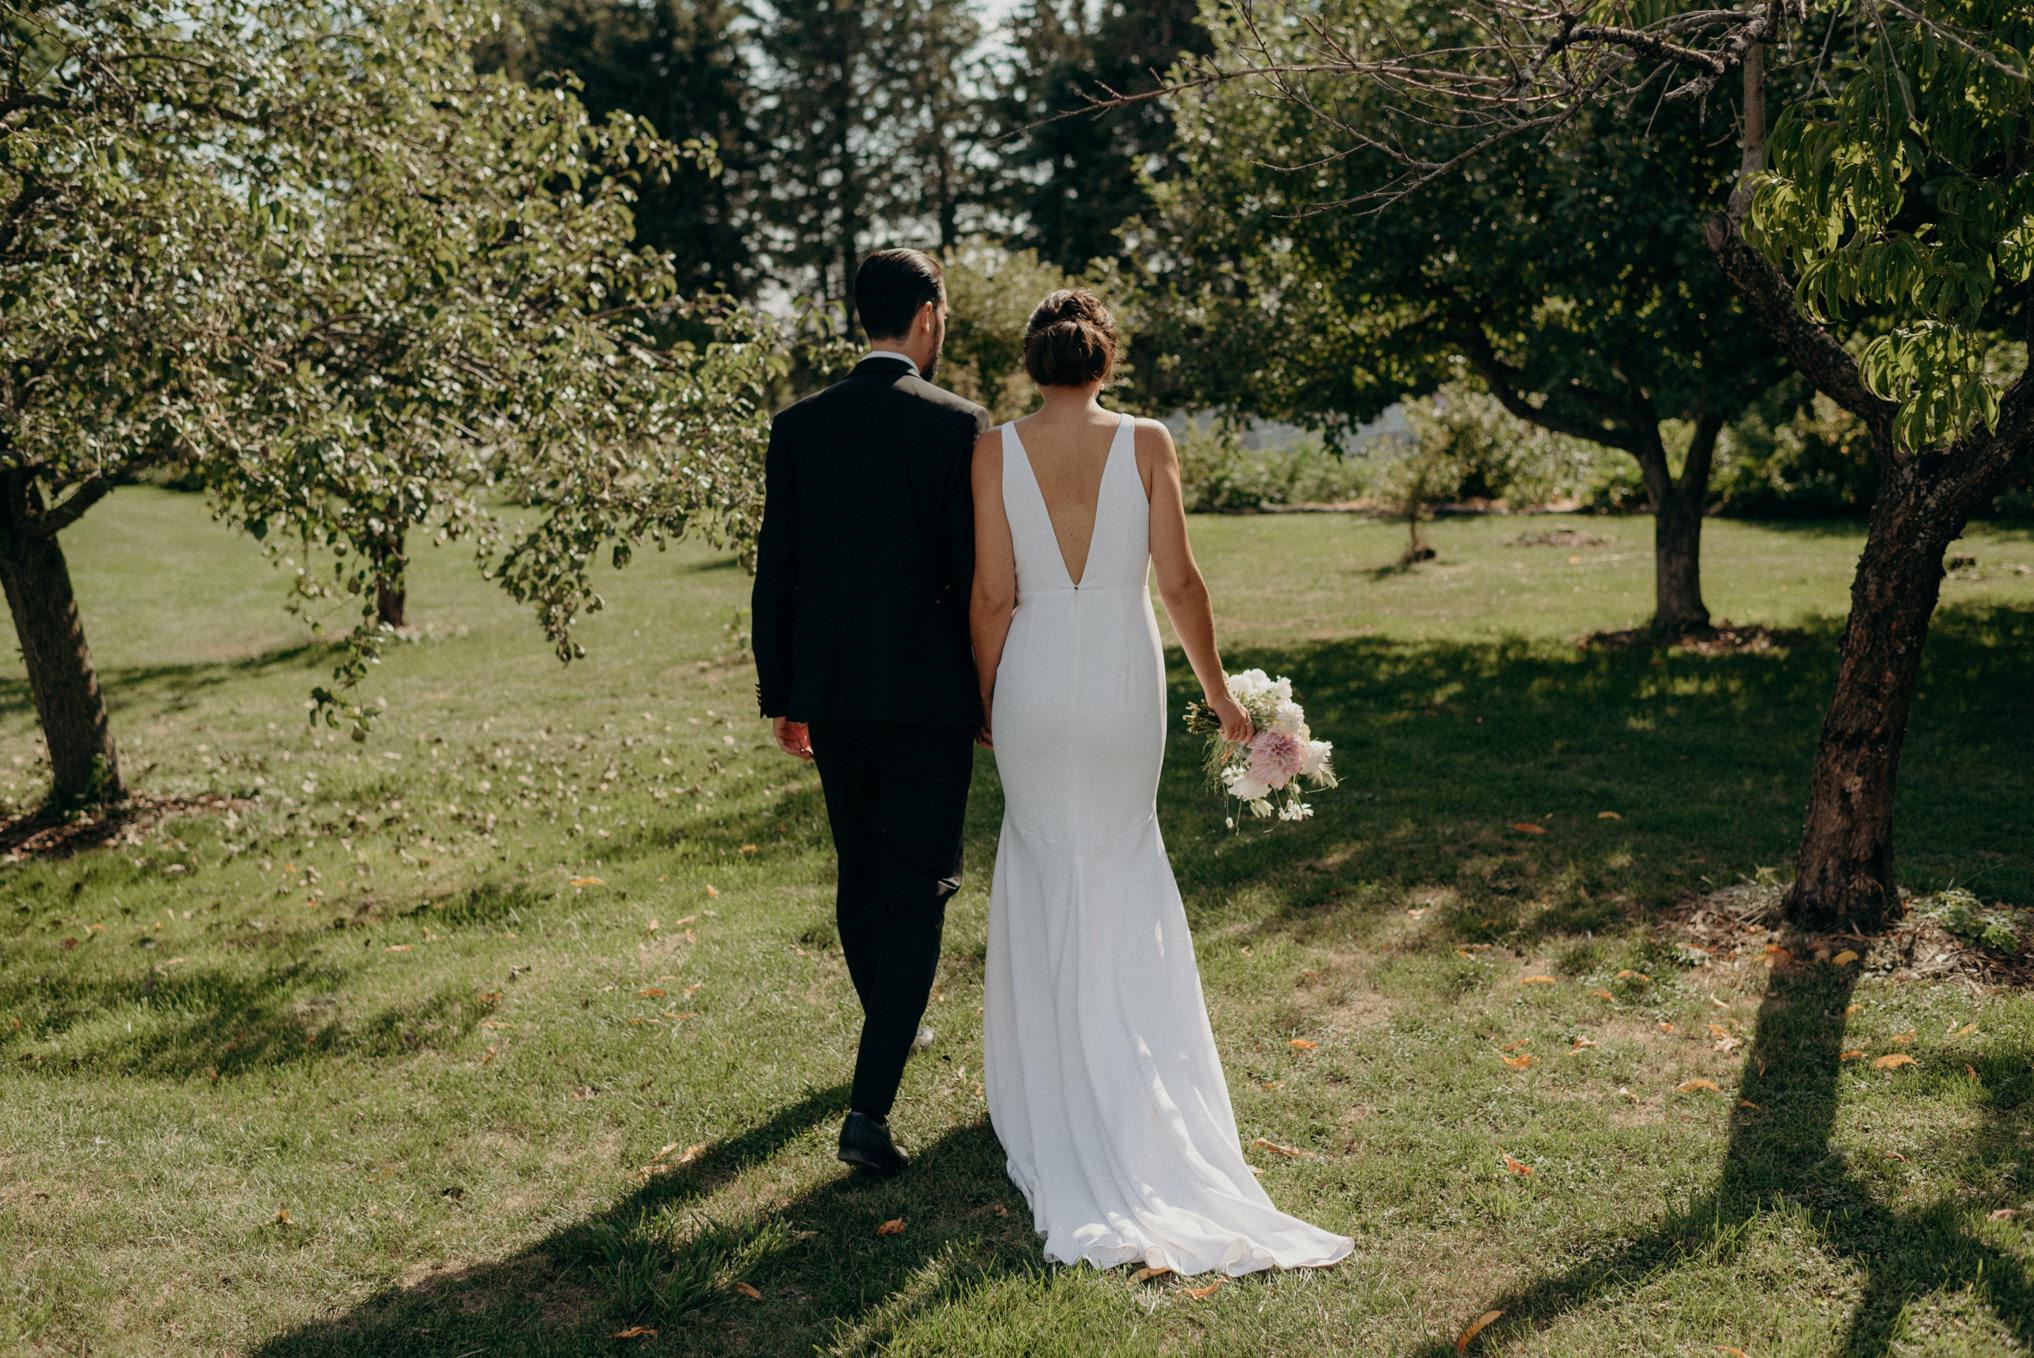 bride and groom walking on grass between trees